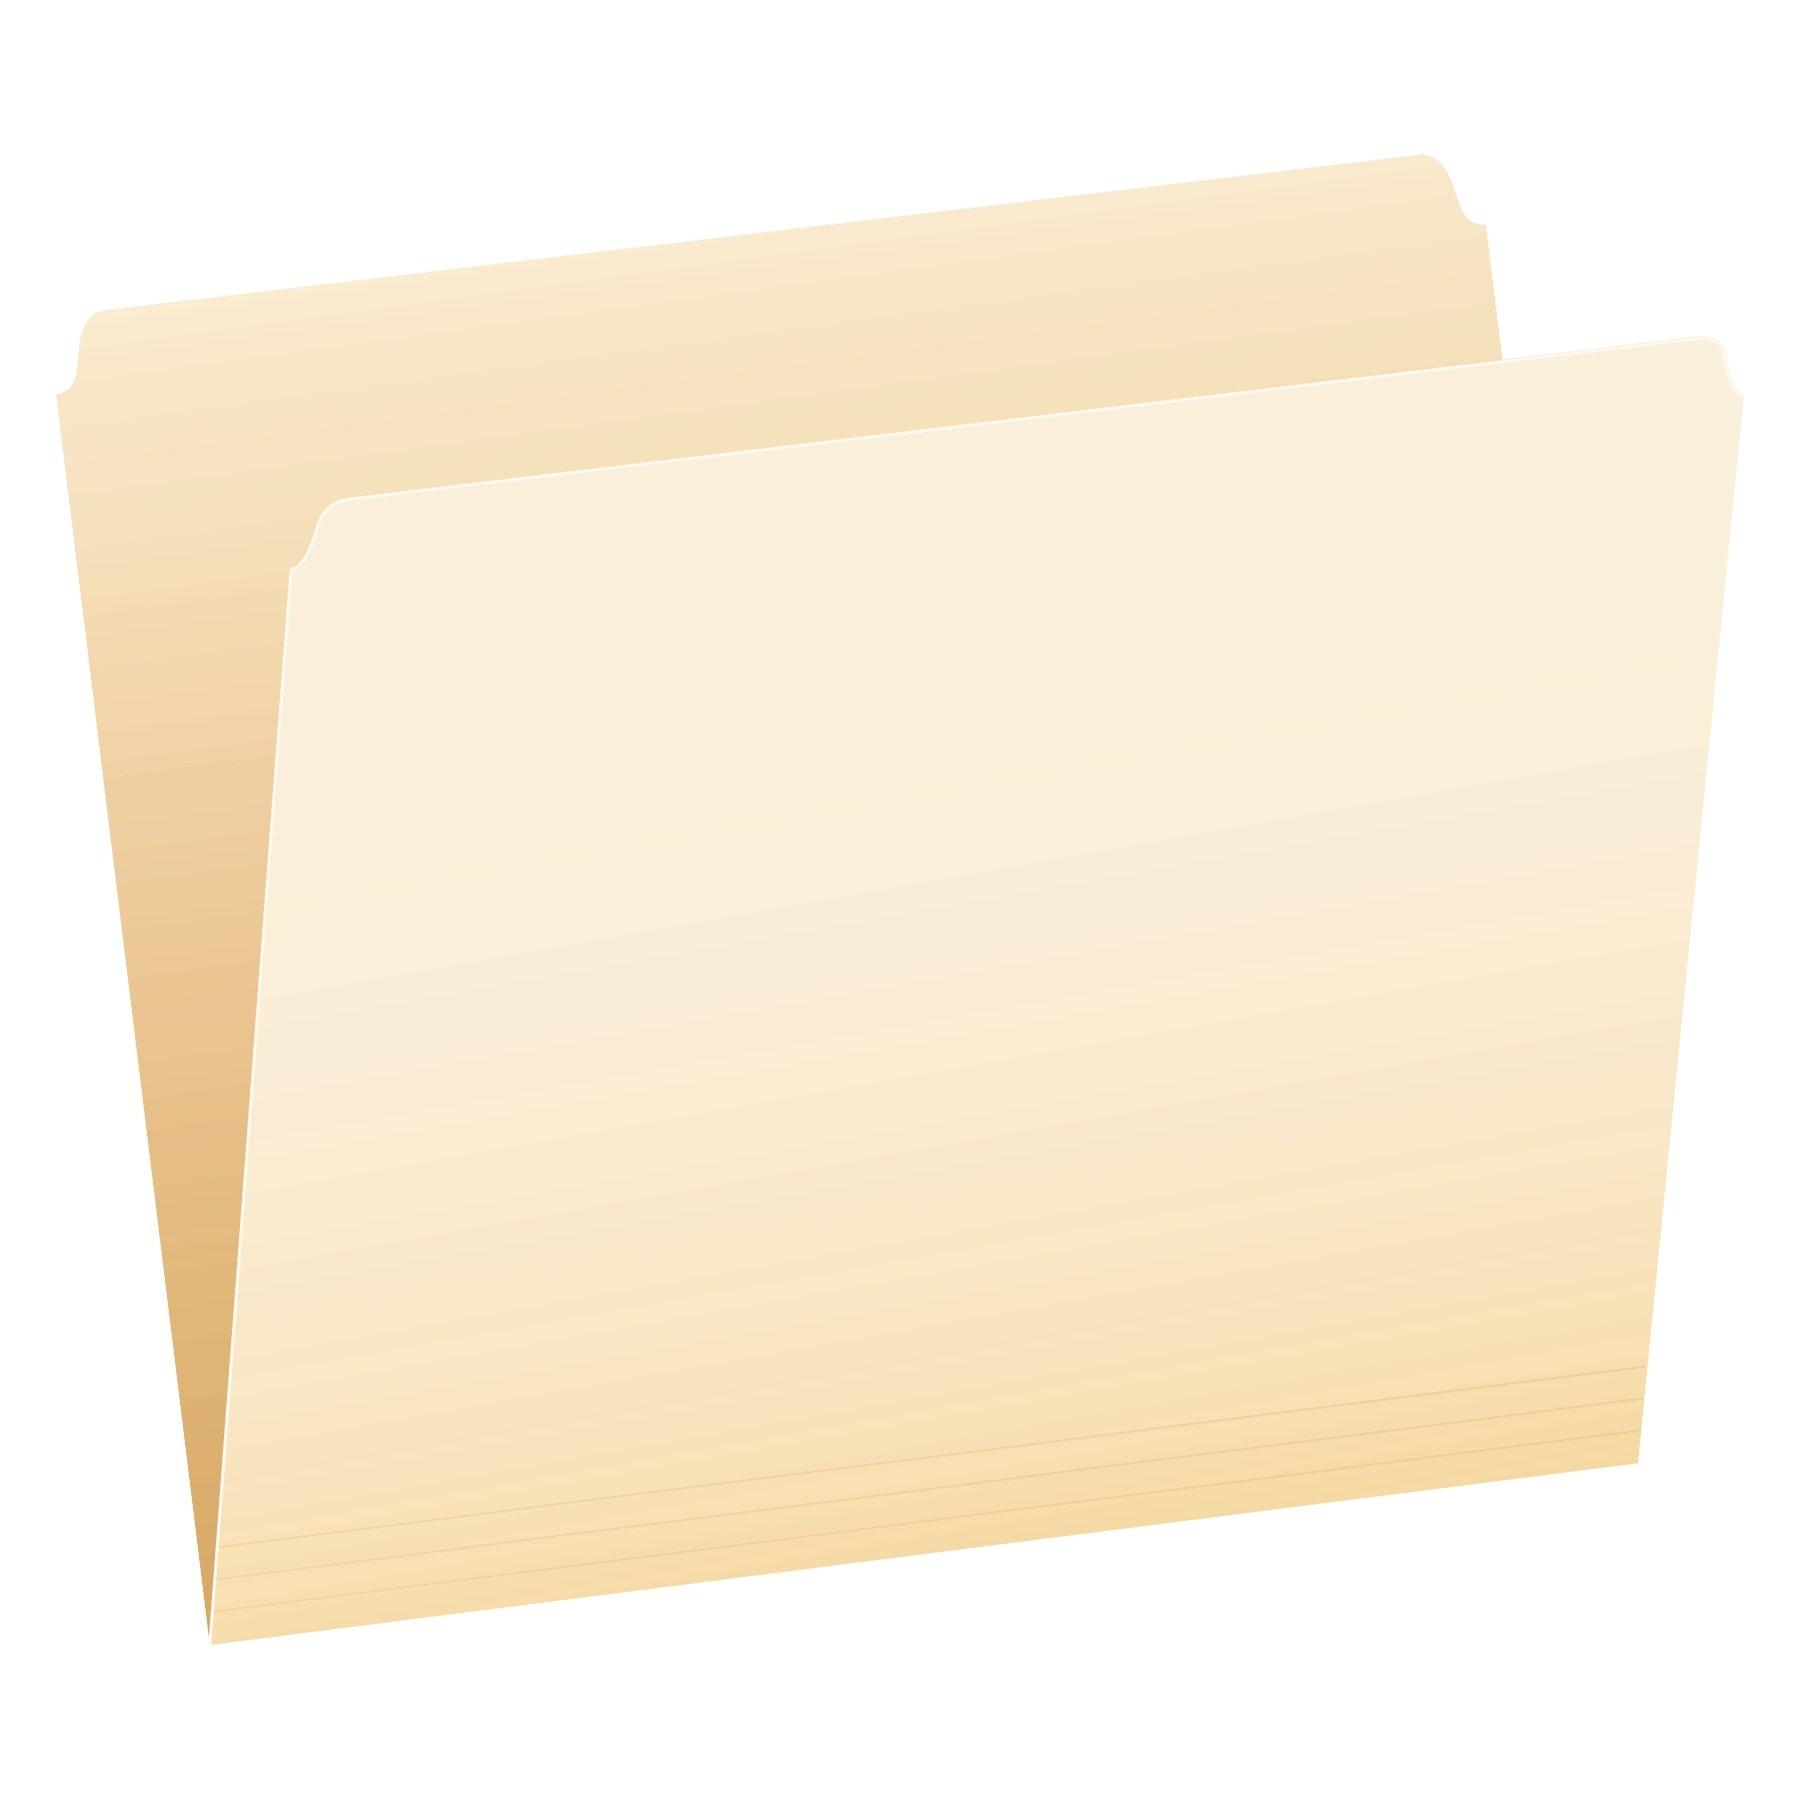 Pendaflex 752 File Folders, Straight Cut, Top Tab, Letter, Manila (Box of 100)